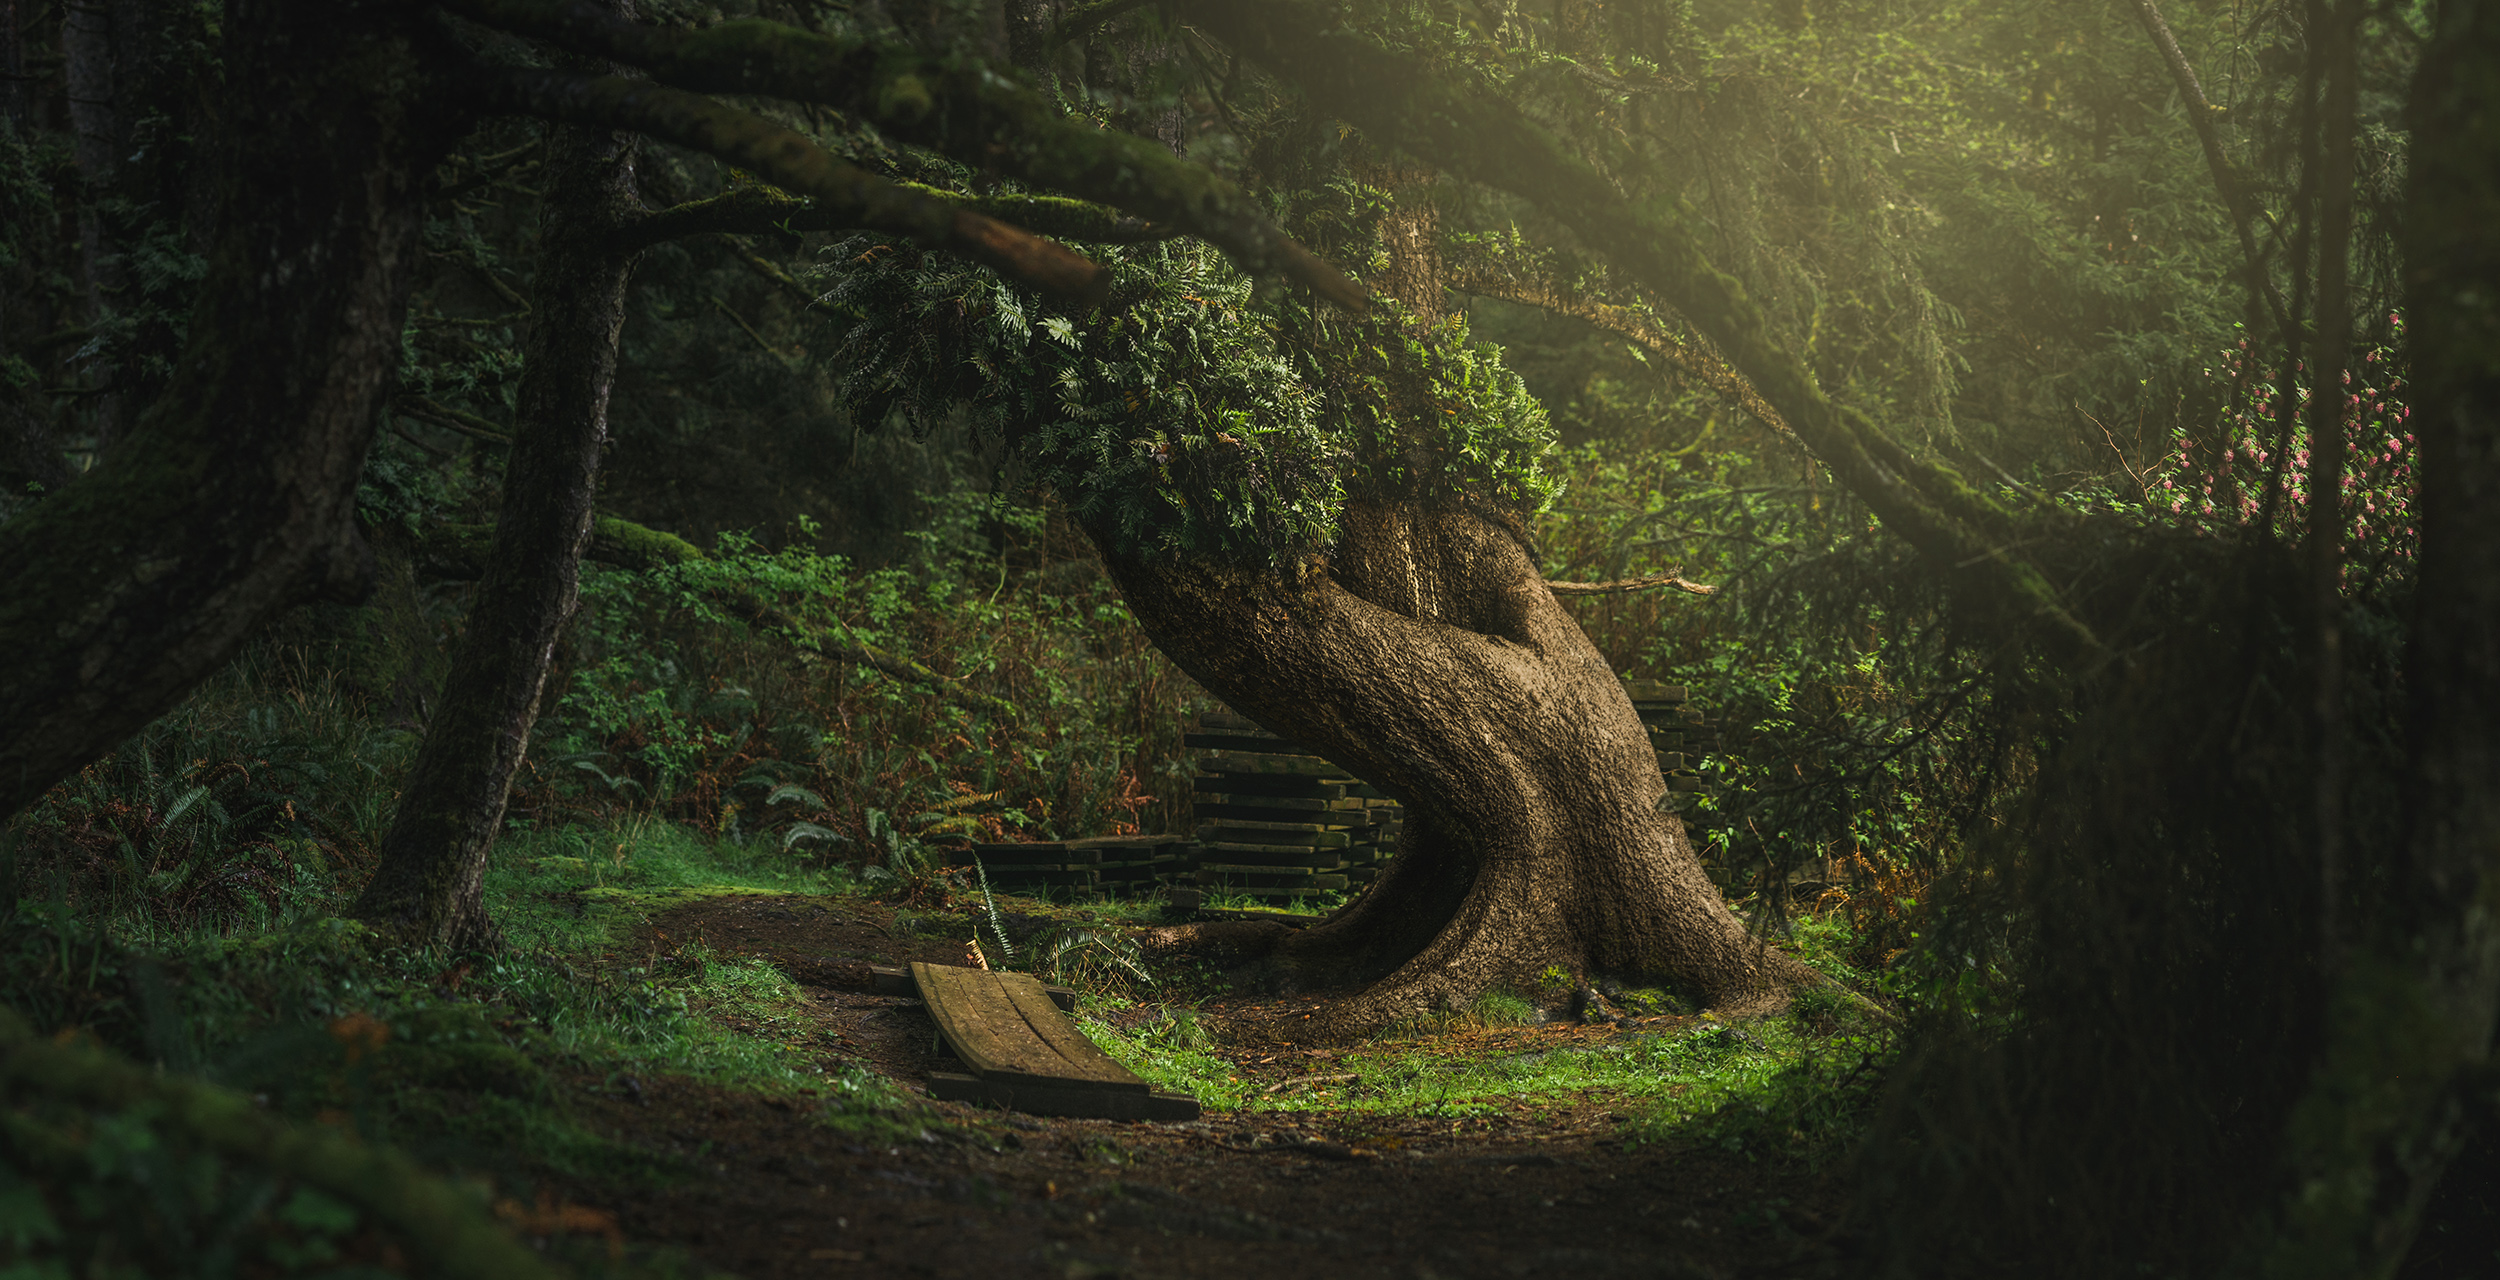 Magical Tree - Orick, CA